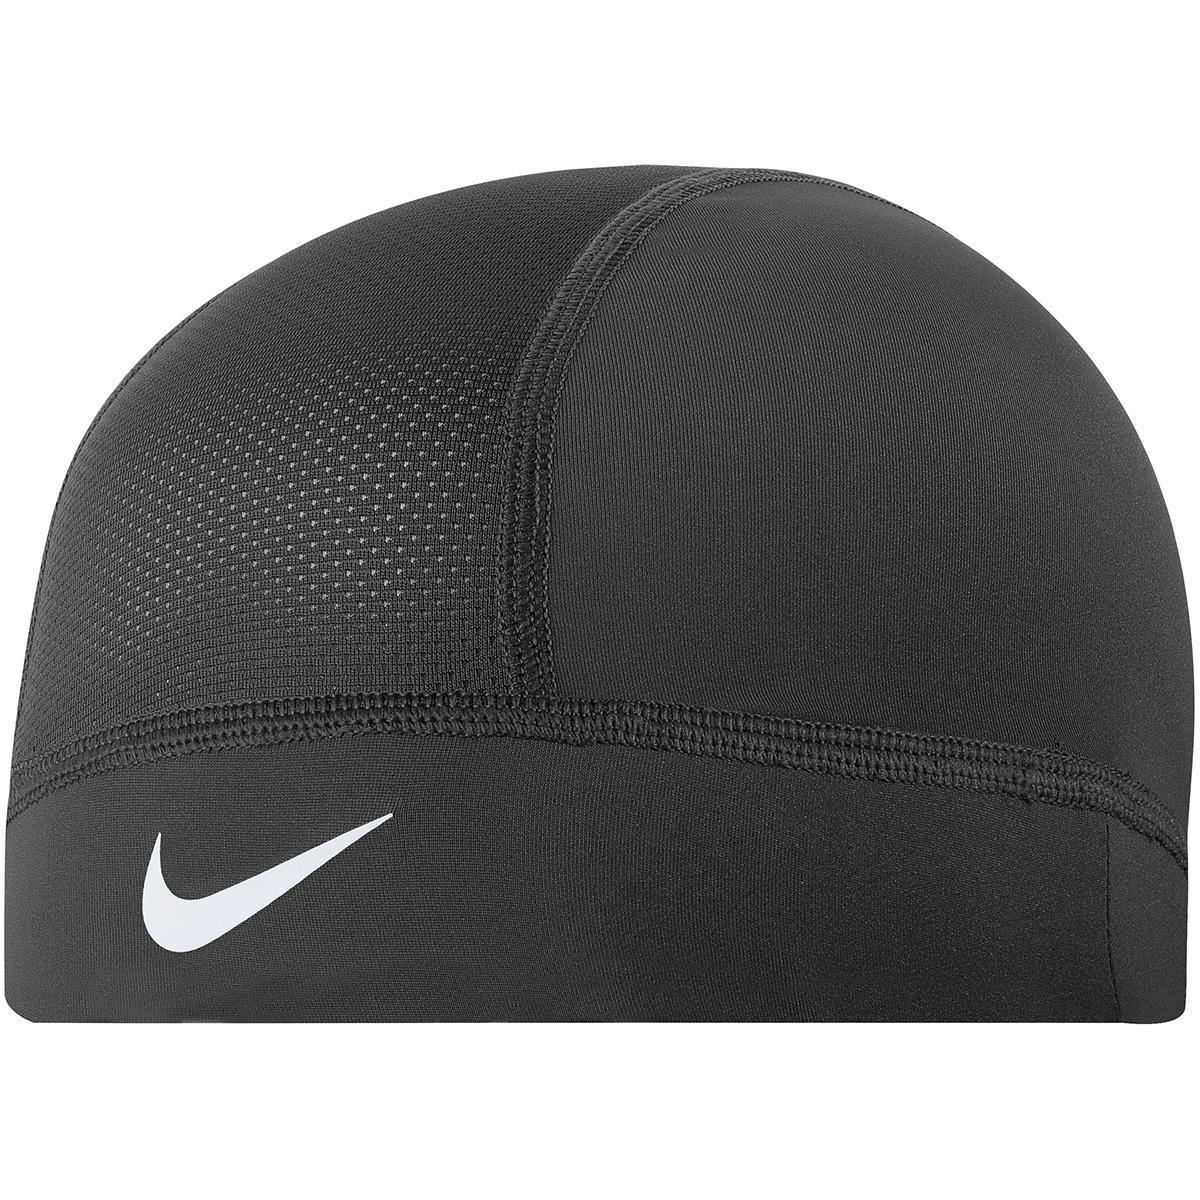 Nike Pro Combat Hyperwarm Skull Cap Black Tennisnuts Com